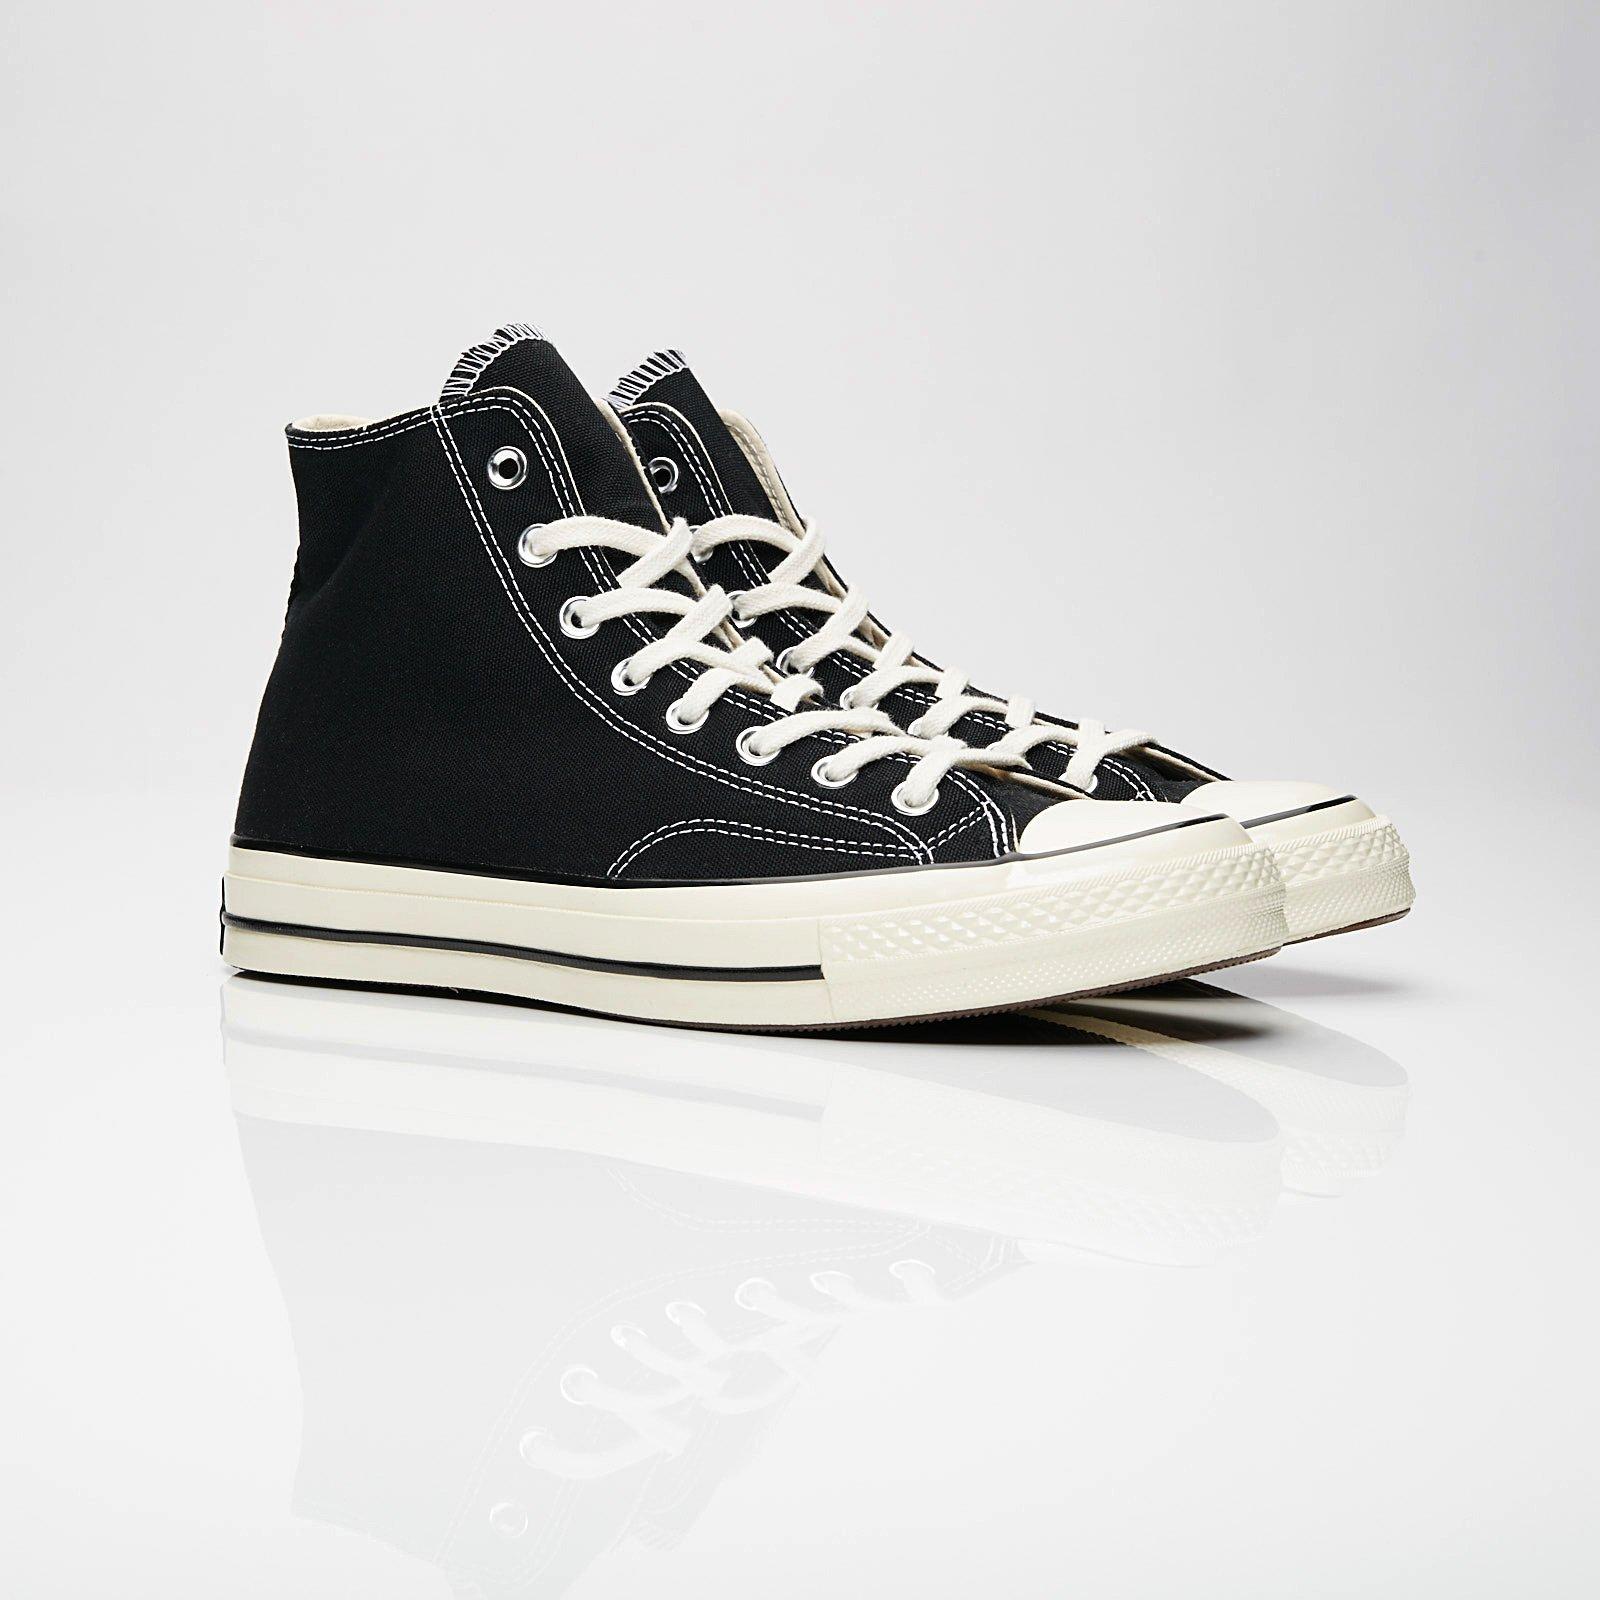 Converse Chuck Taylor 70 Hi 162050c Sneakersnstuff